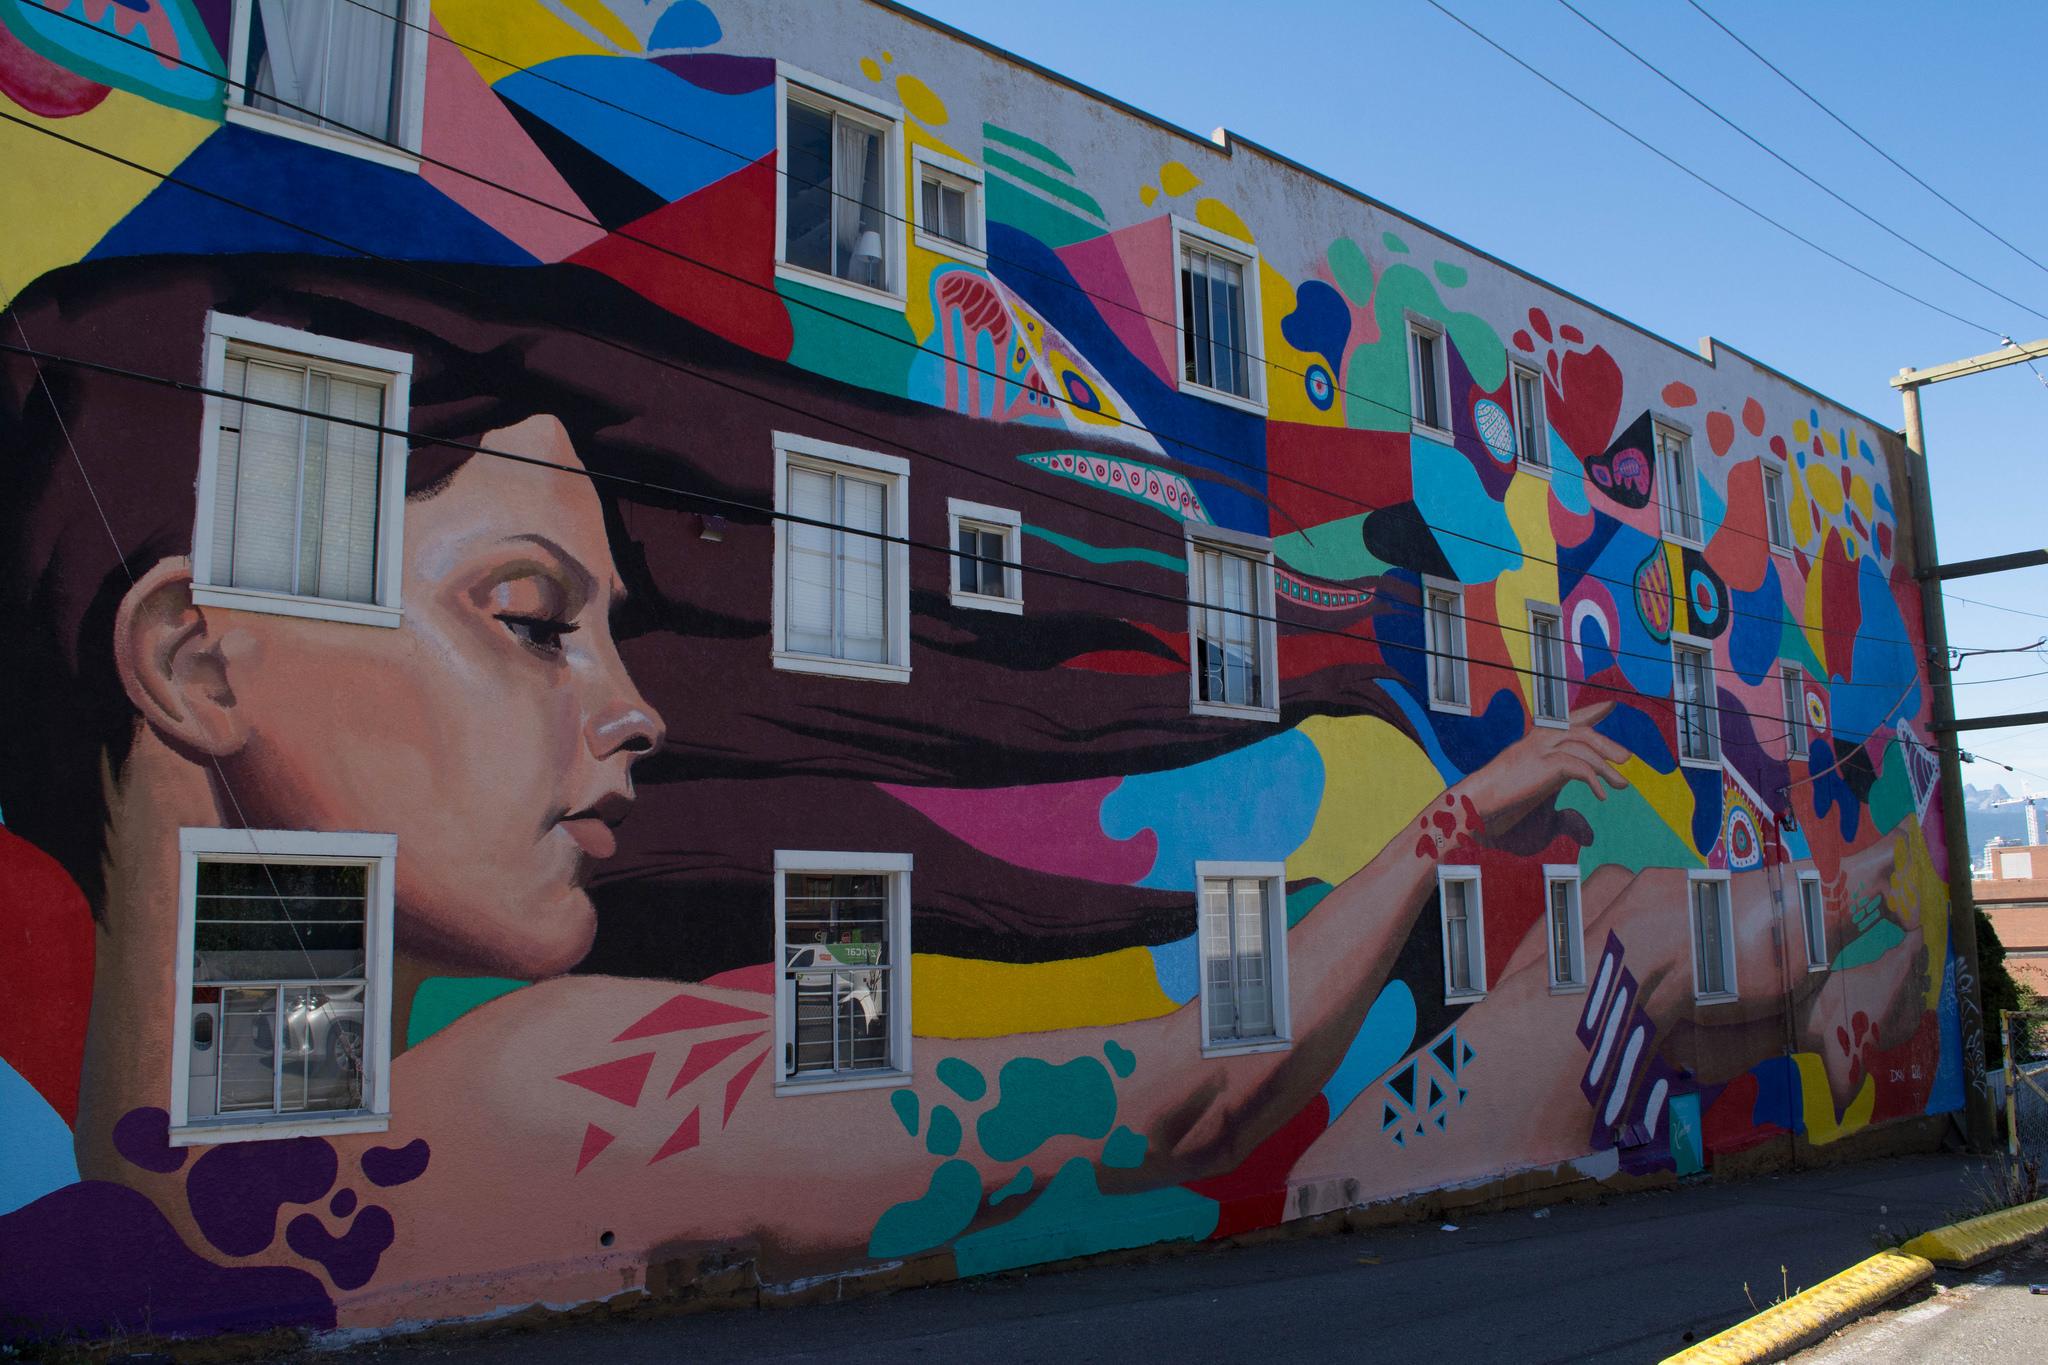 Vancouver Mural Festival 2017 | Vancouver BC Photos